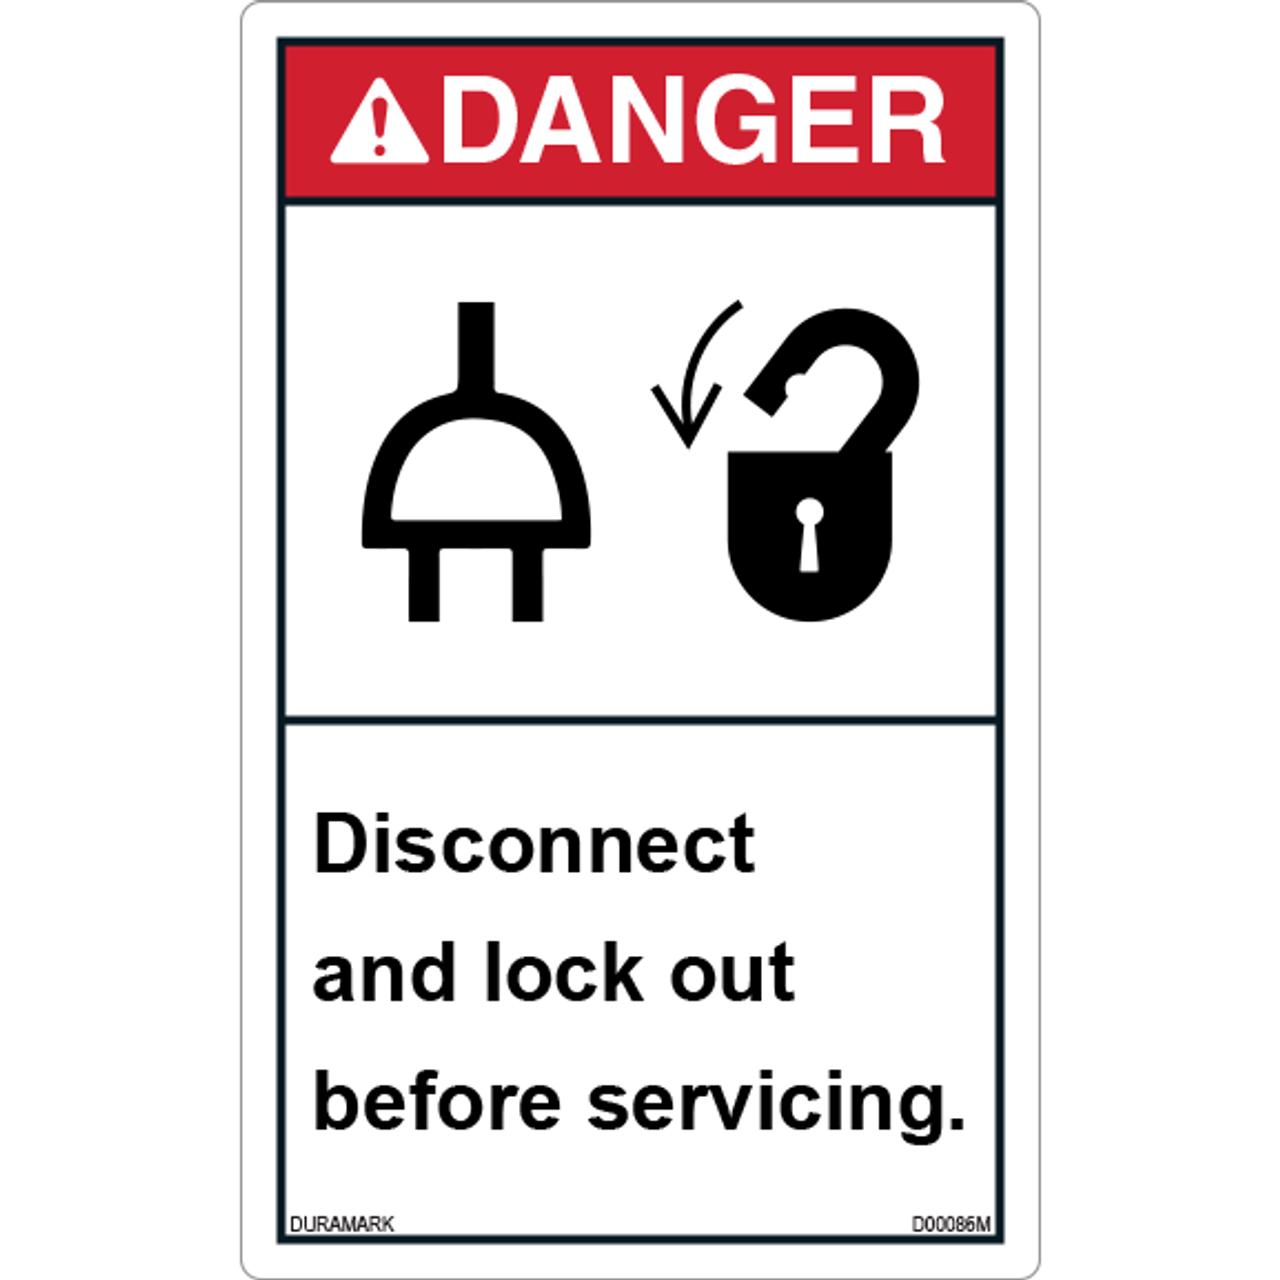 ANSI Safety Label - Danger - Lockout - Disconnect Before Servicing - Vertical